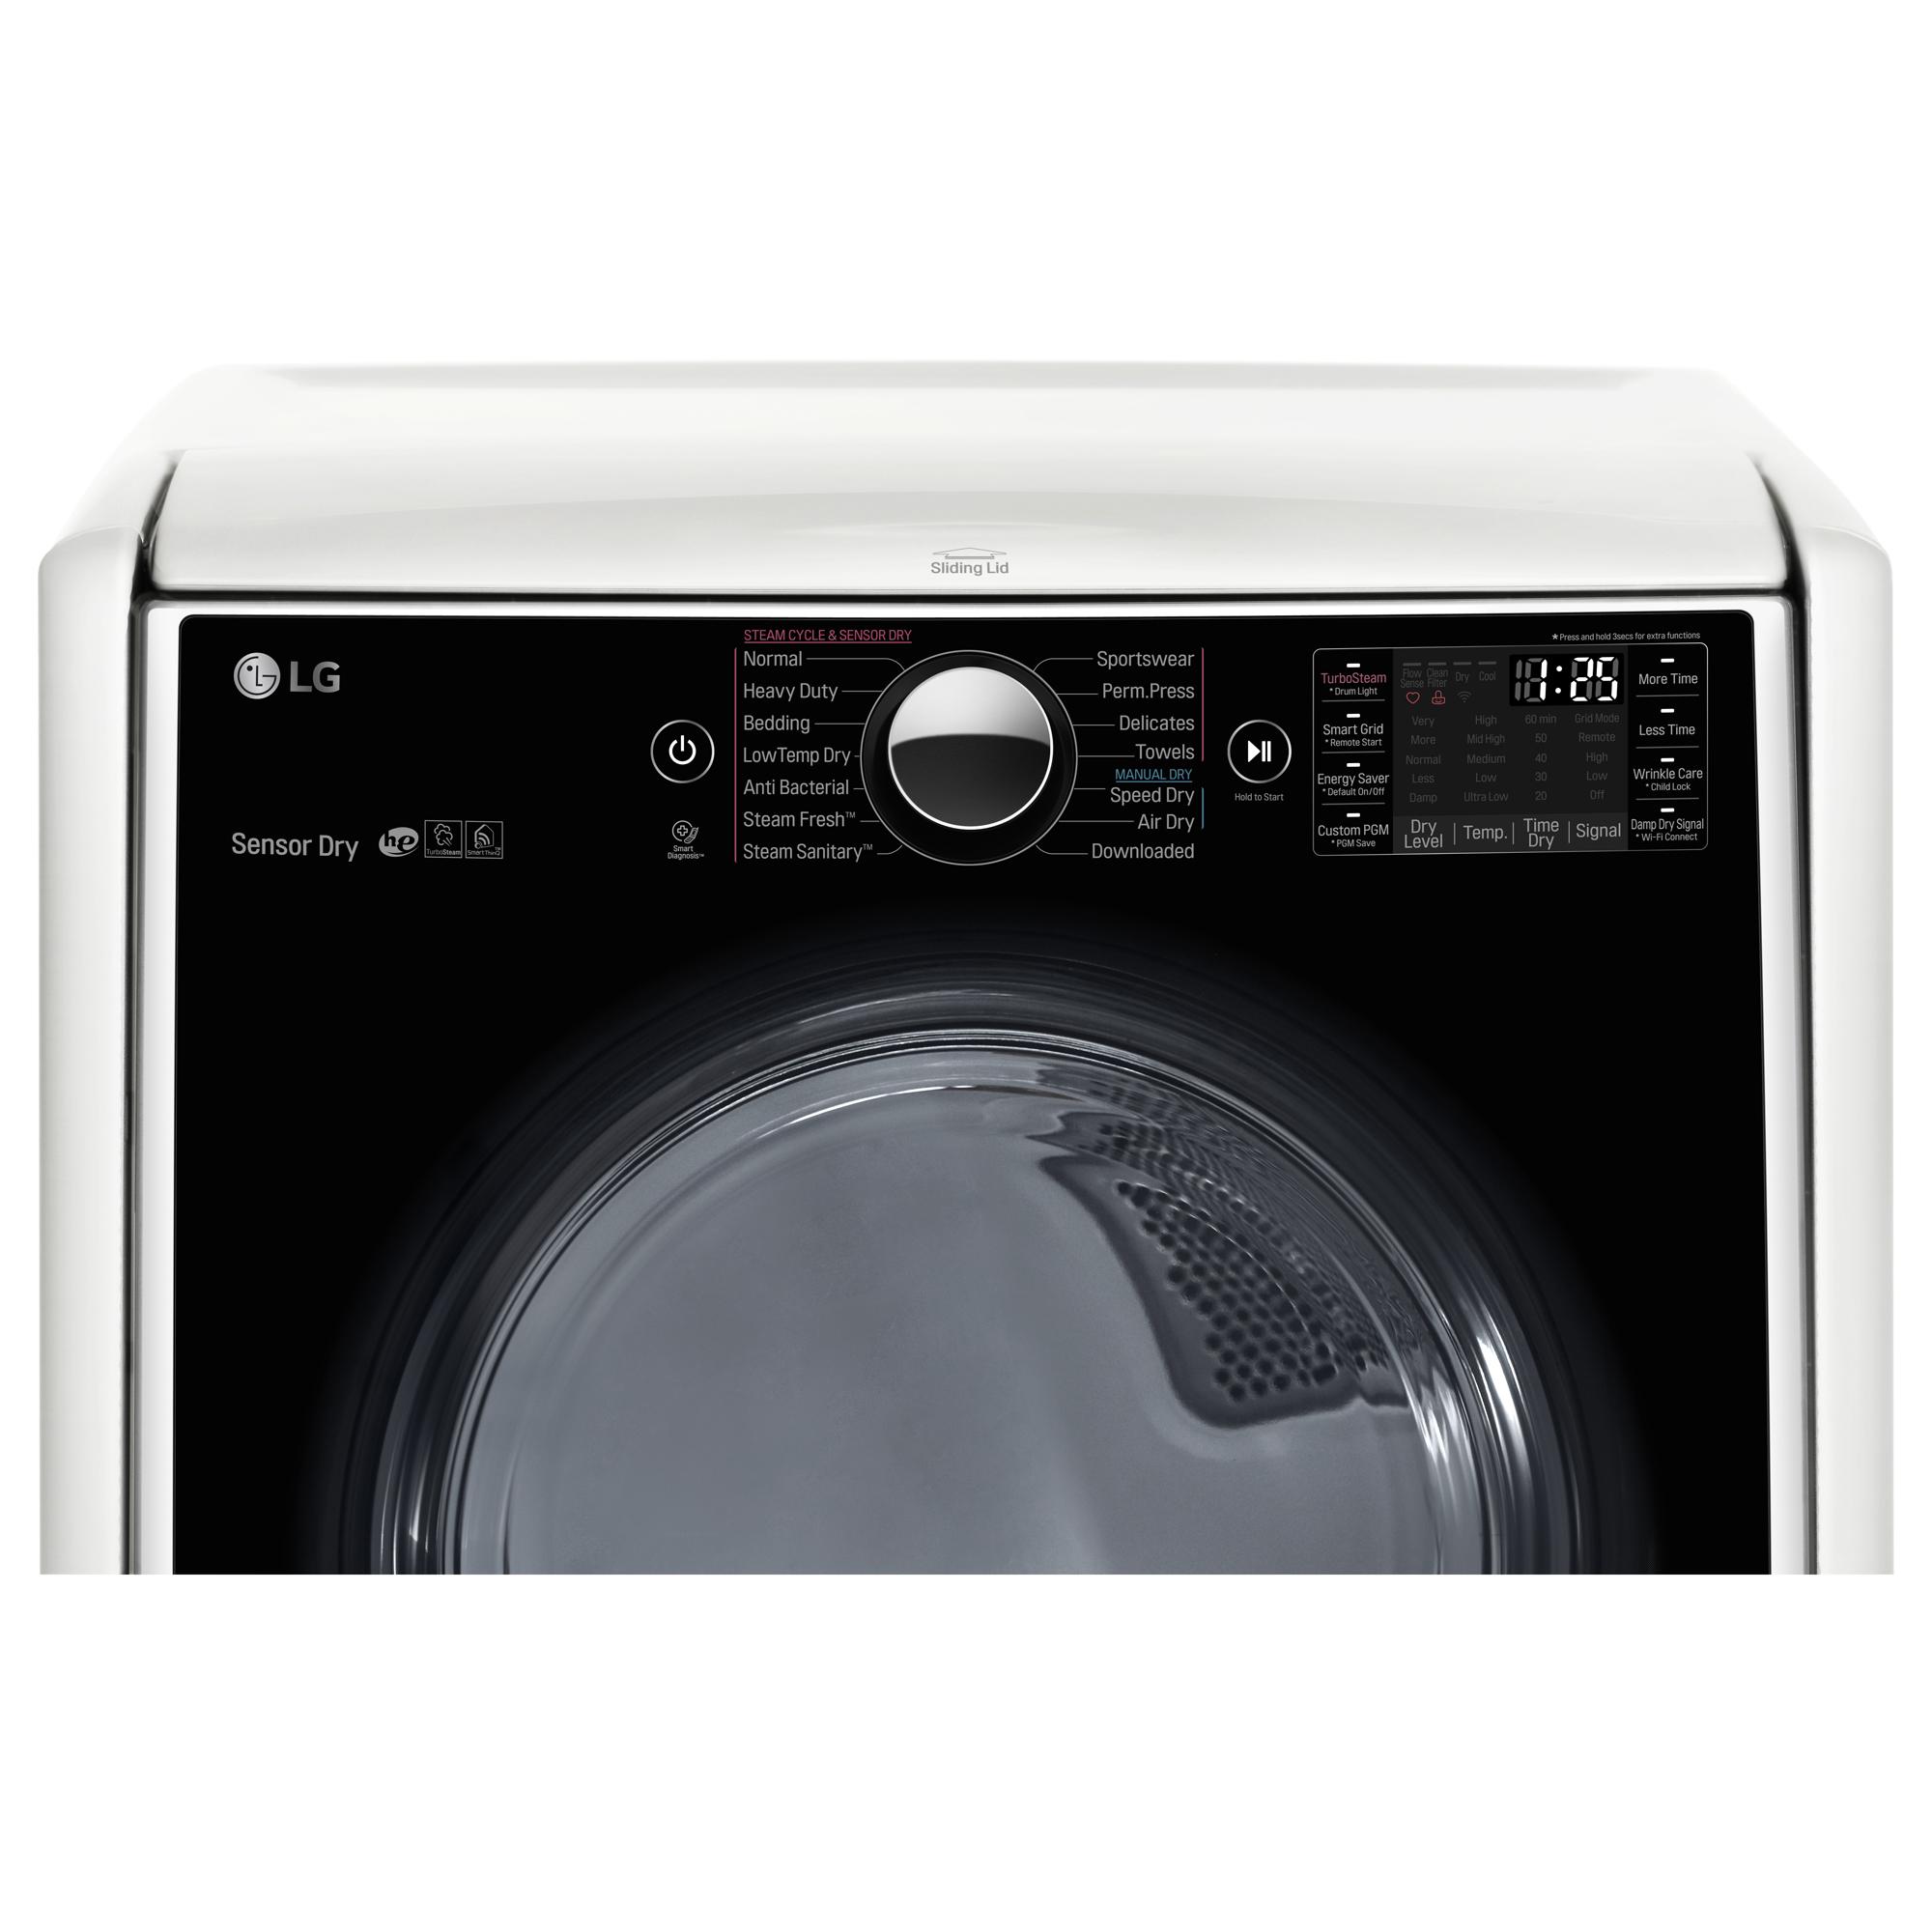 LG DLGX5001W 7.4 cu. ft. Gas Dryer w/ TurboSteam™ Technology – White